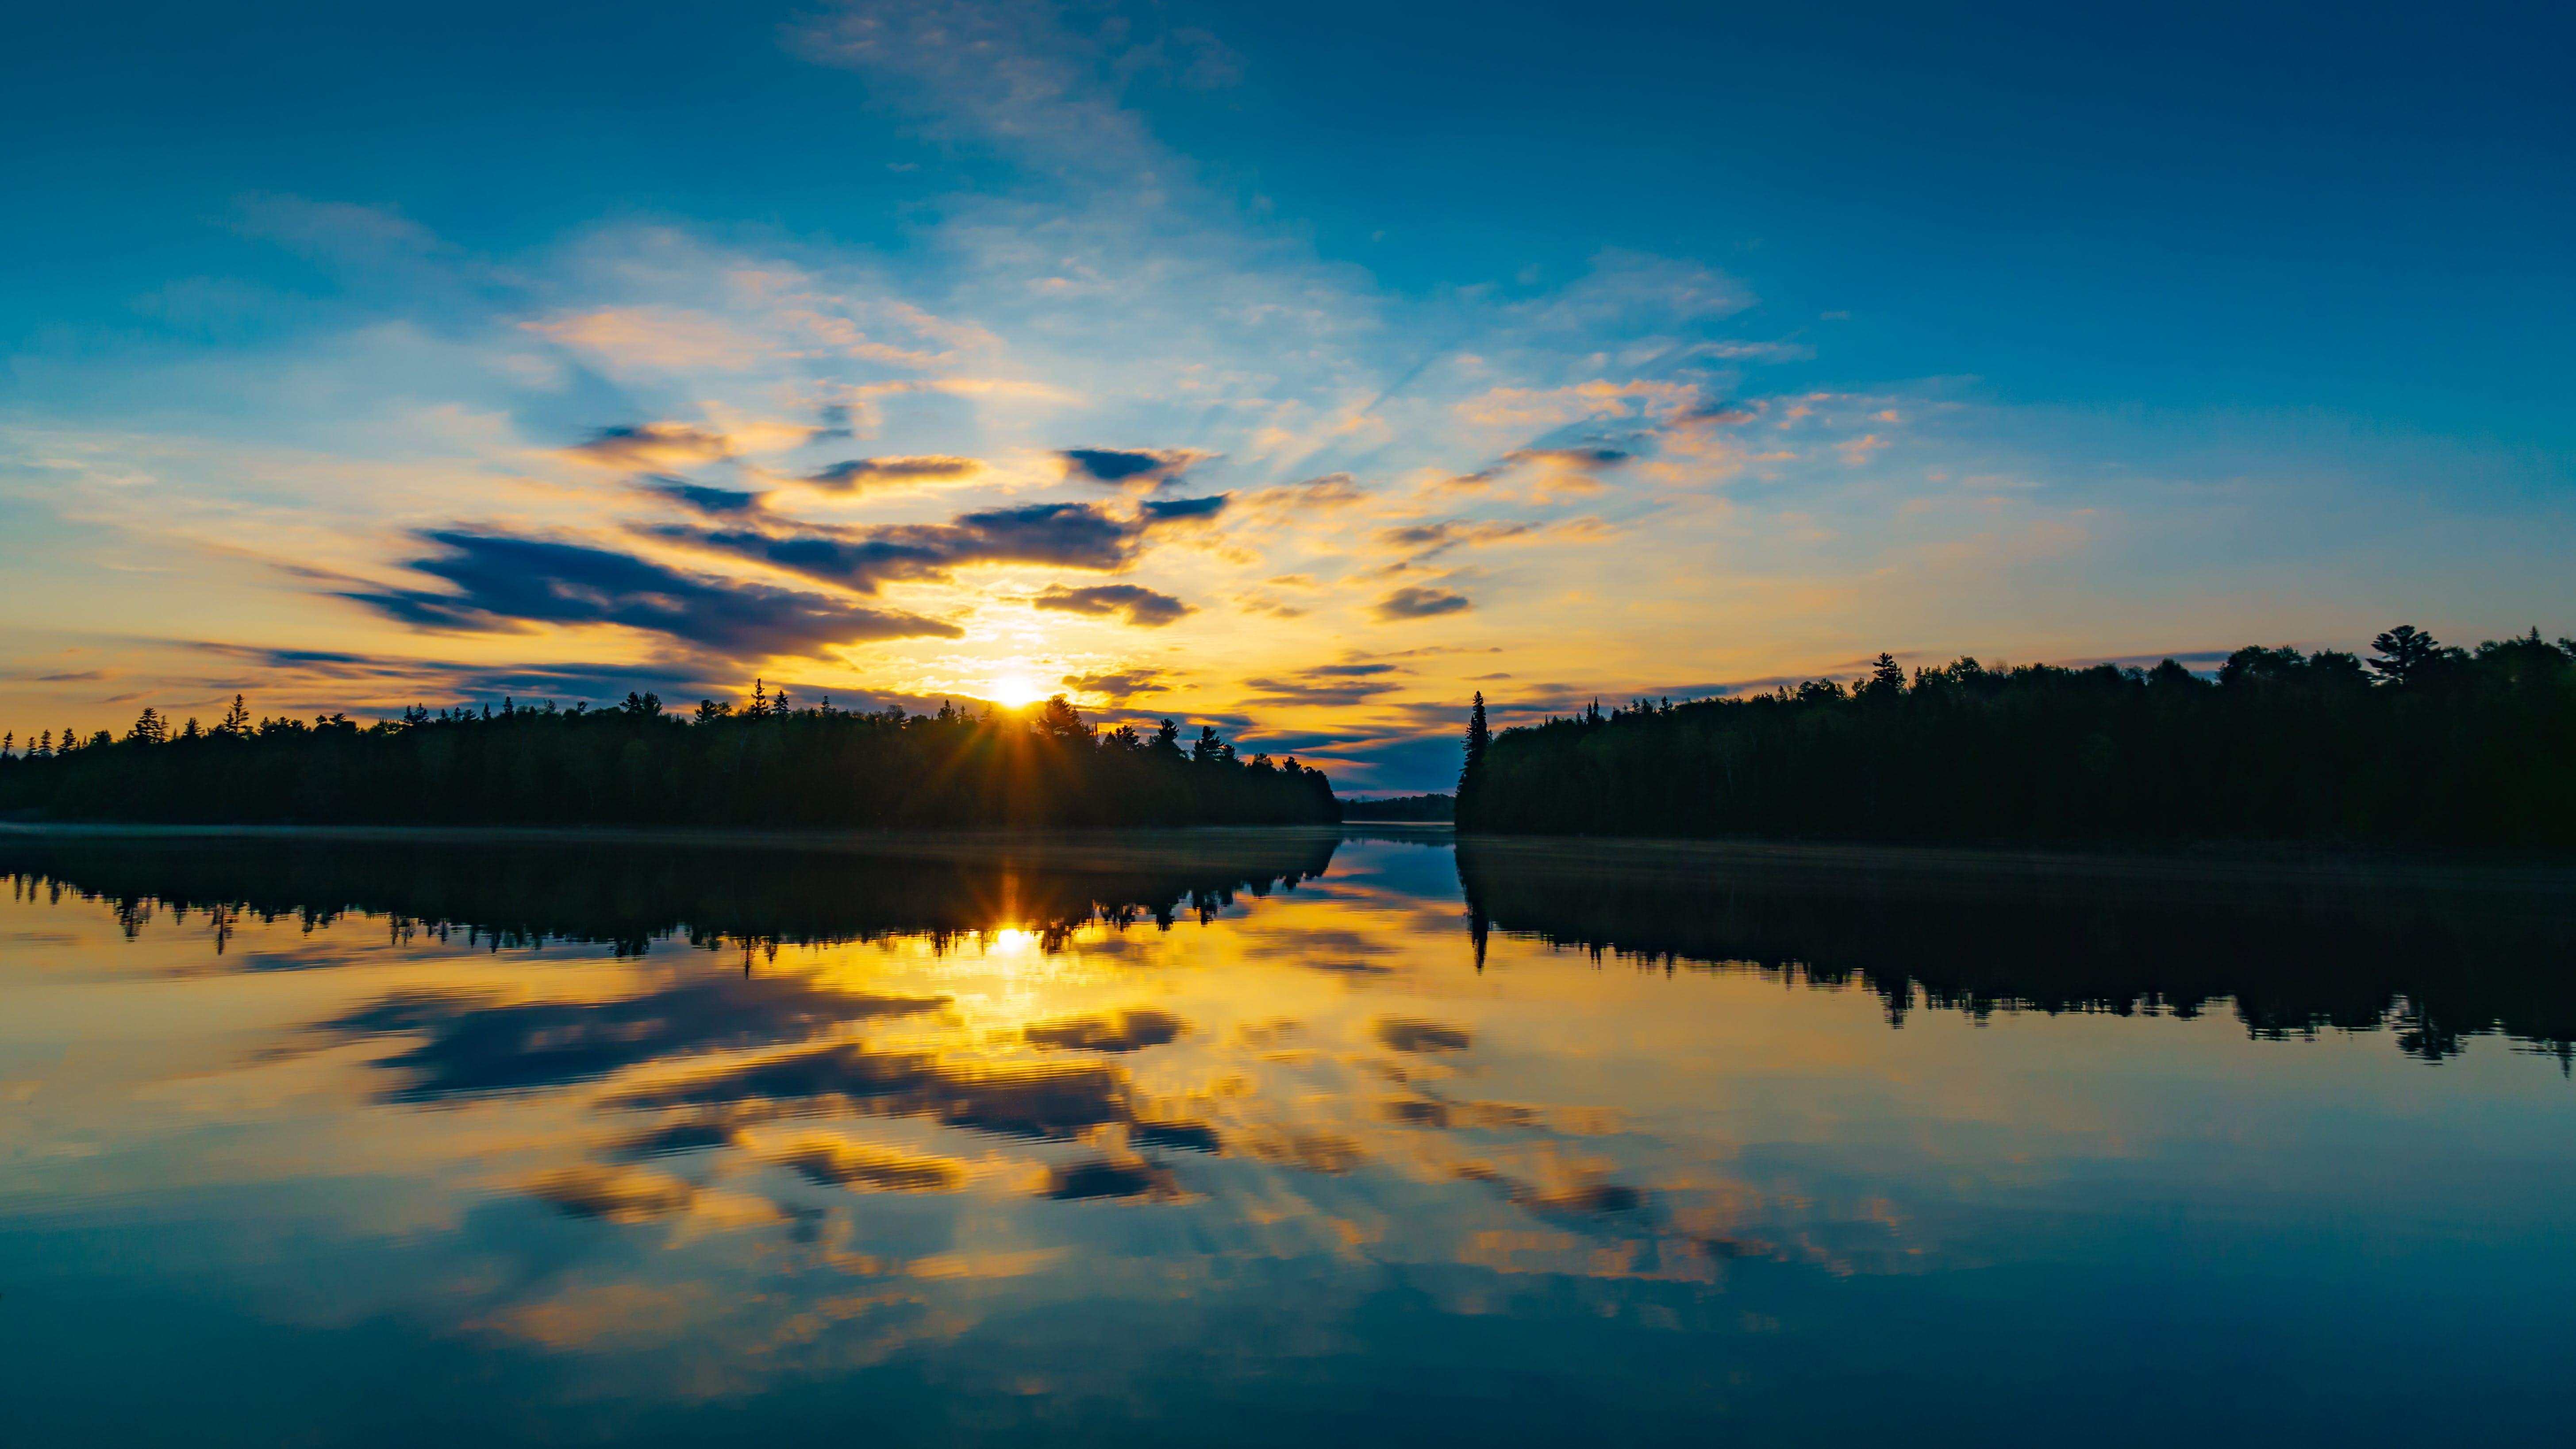 Kostenloses Stock Foto zu bäume, blauer himmel, dämmerung, friedlich